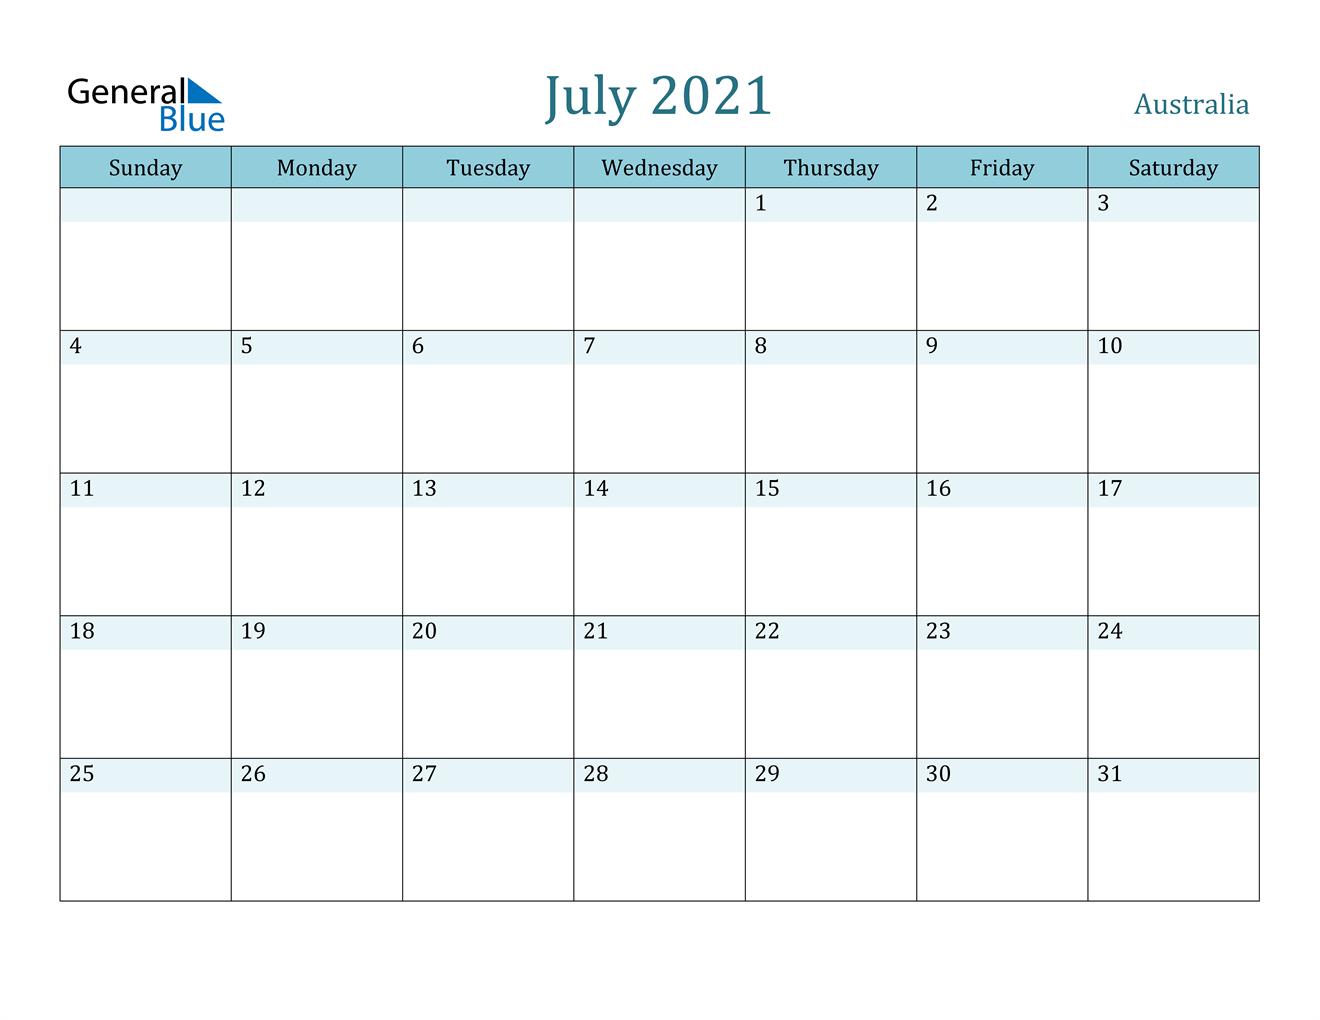 July 2021 Calendar - Australia